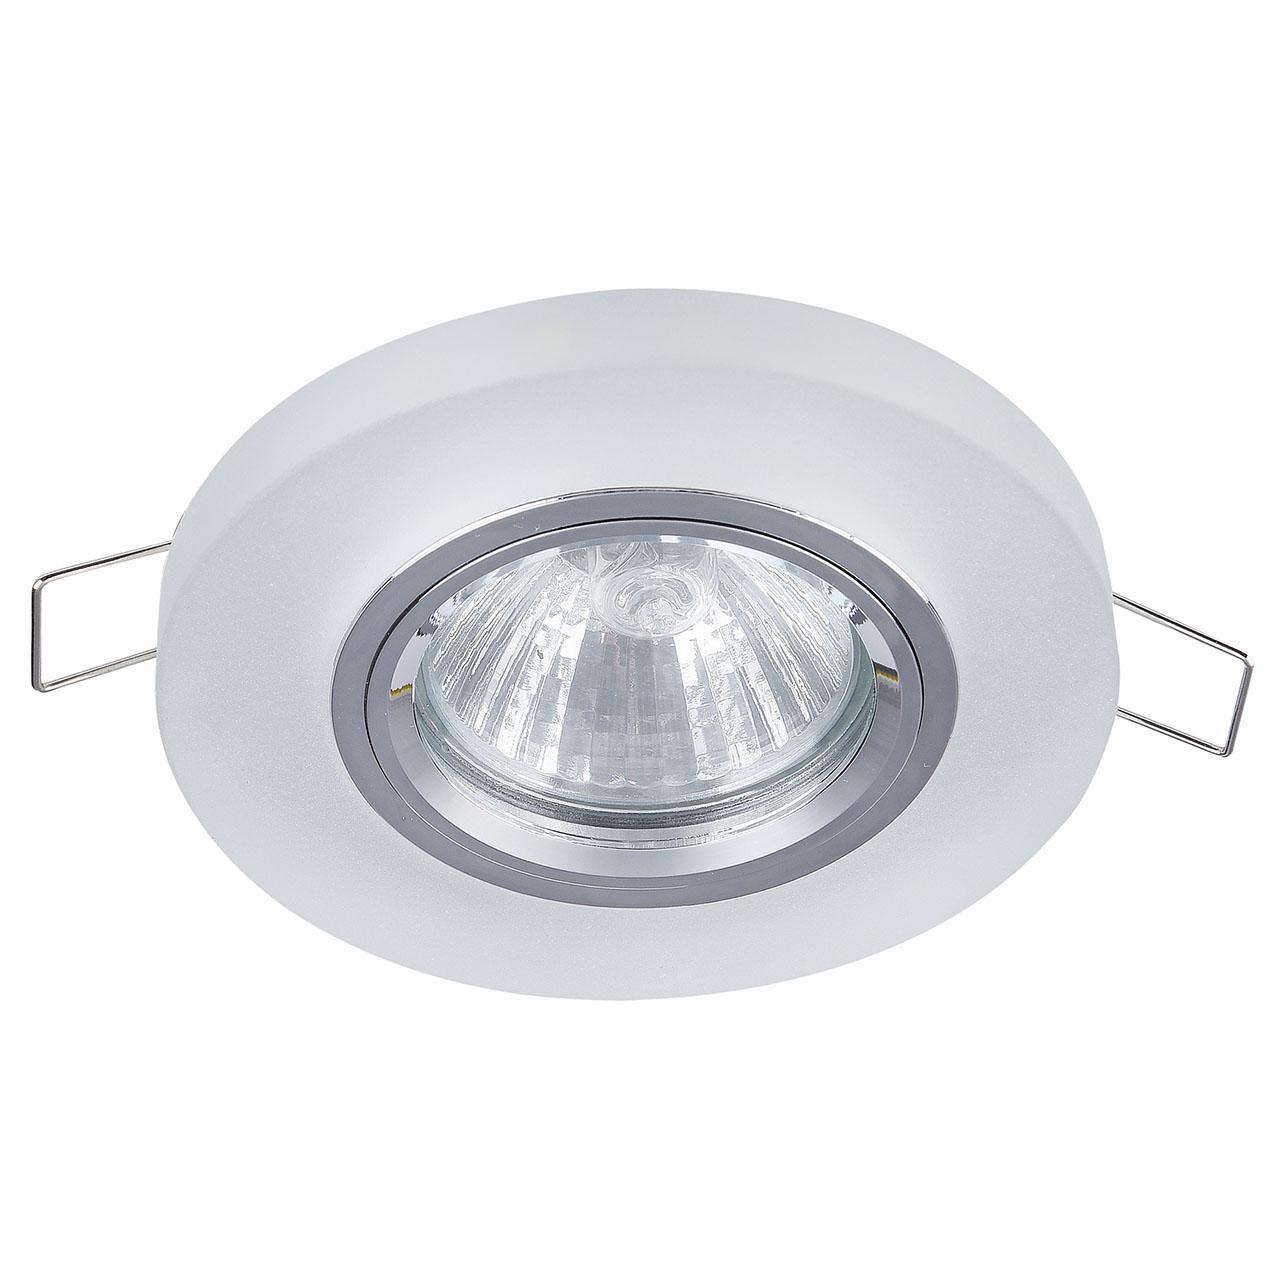 Фото - Встраиваемый светильник Maytoni Metal DL291-2-3W-W 7000k 3w 200 lumen white 3 led streetlight emitter metal strip w optical lens 9 11v